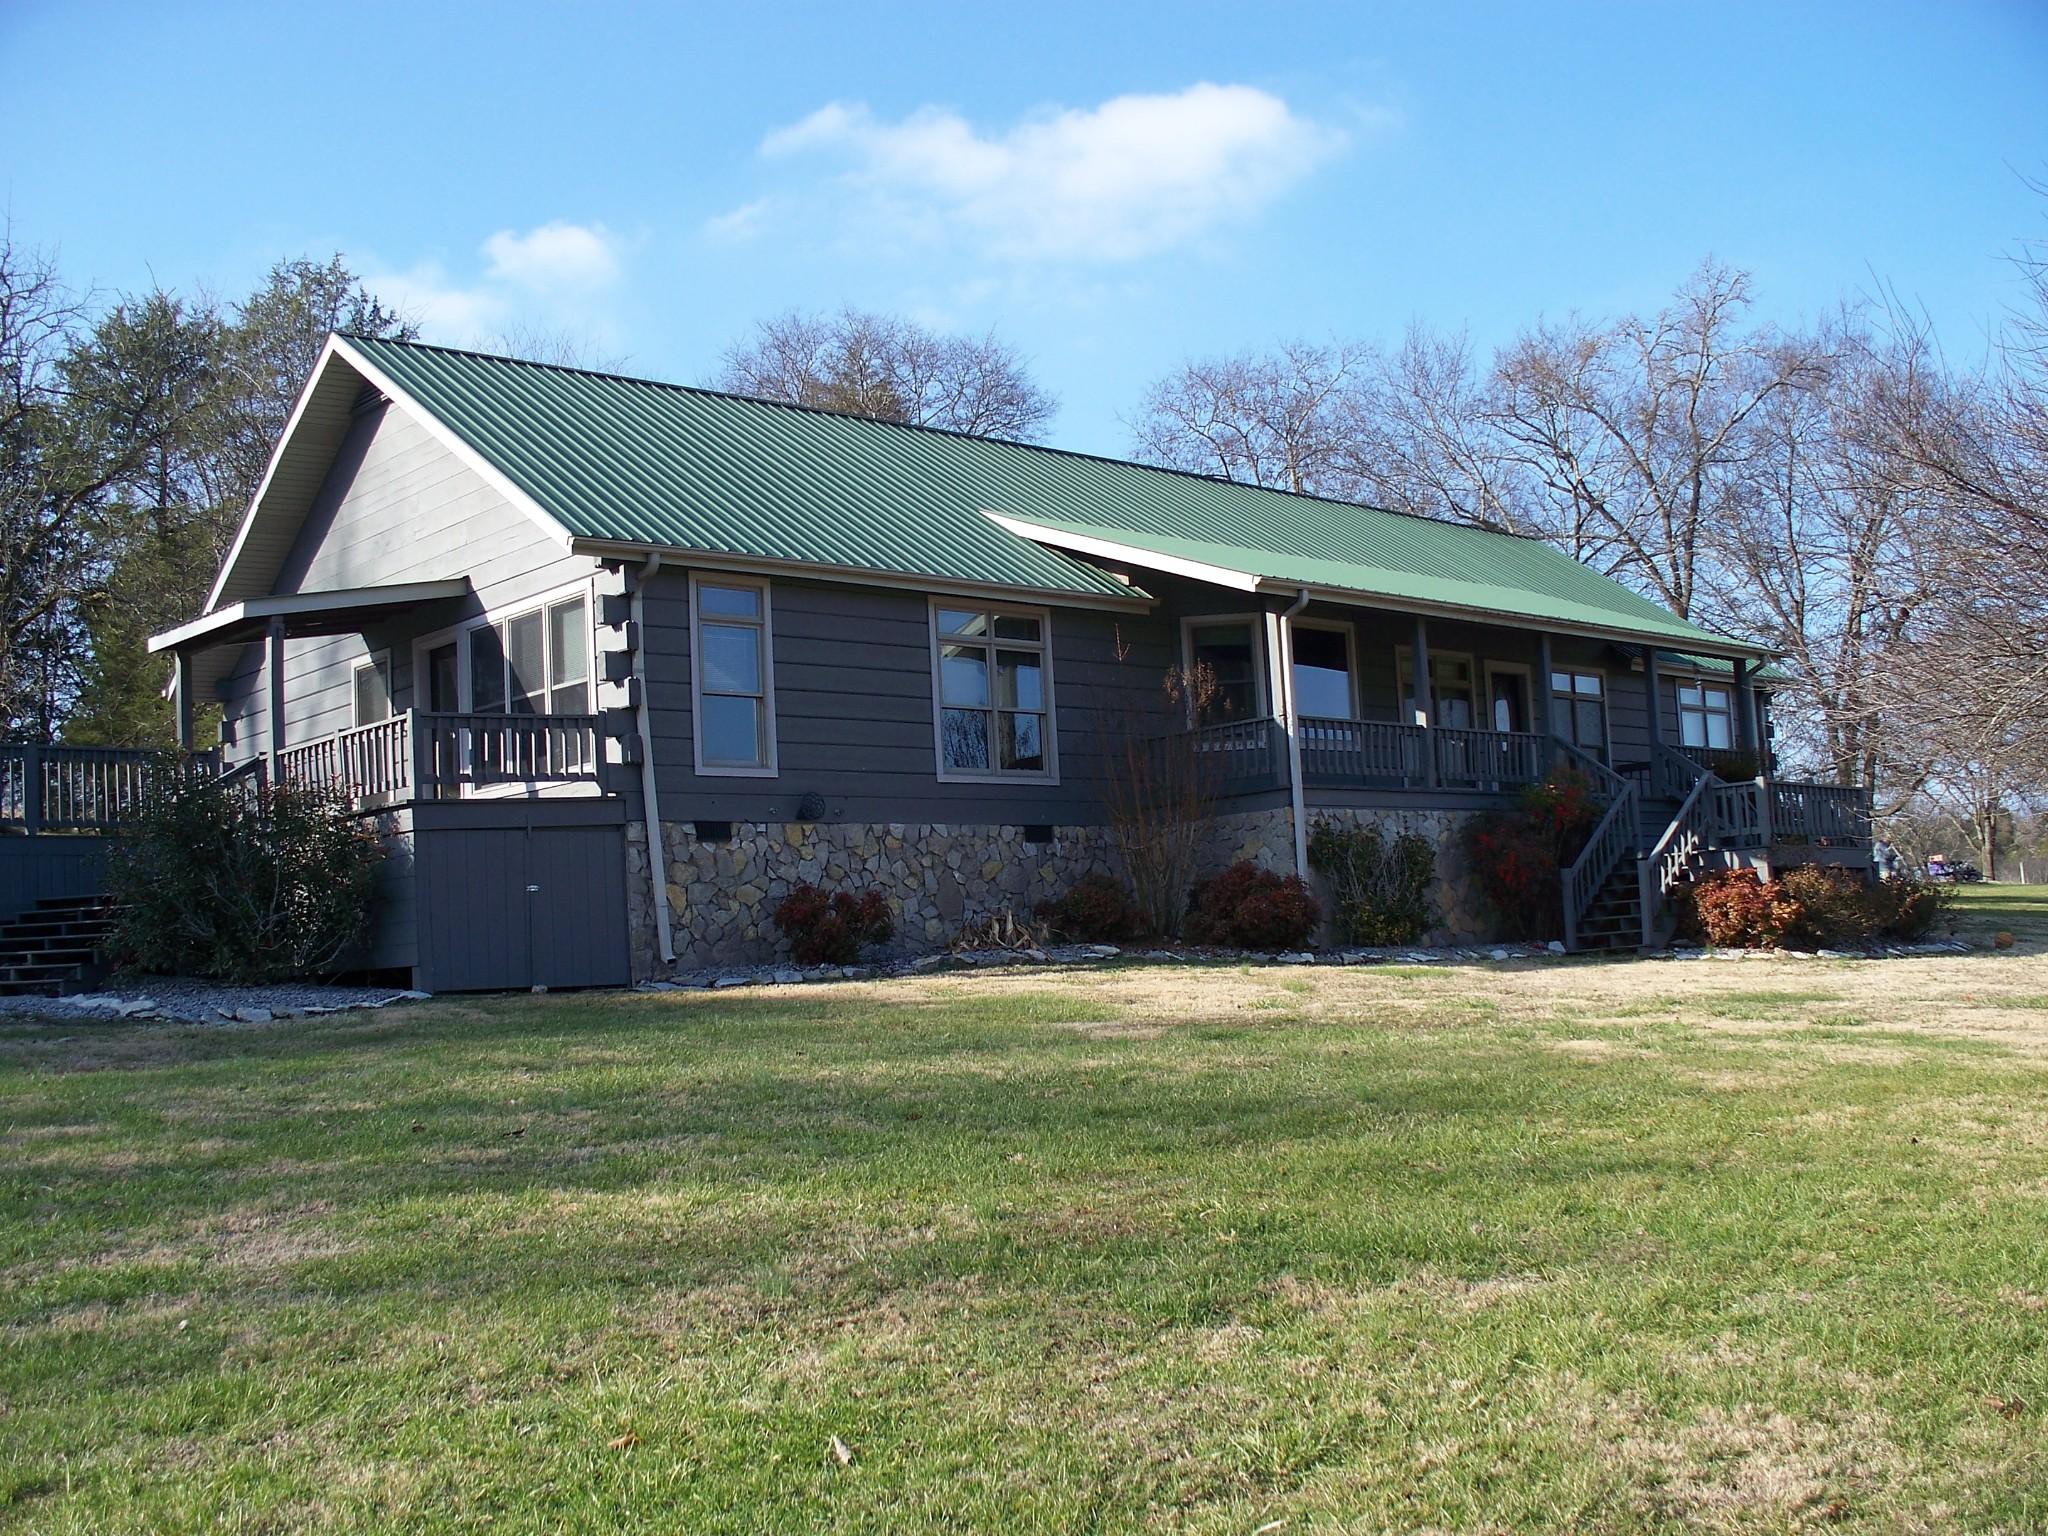 2120 Tramel Branch Rd, Alexandria, TN 37012 - Alexandria, TN real estate listing